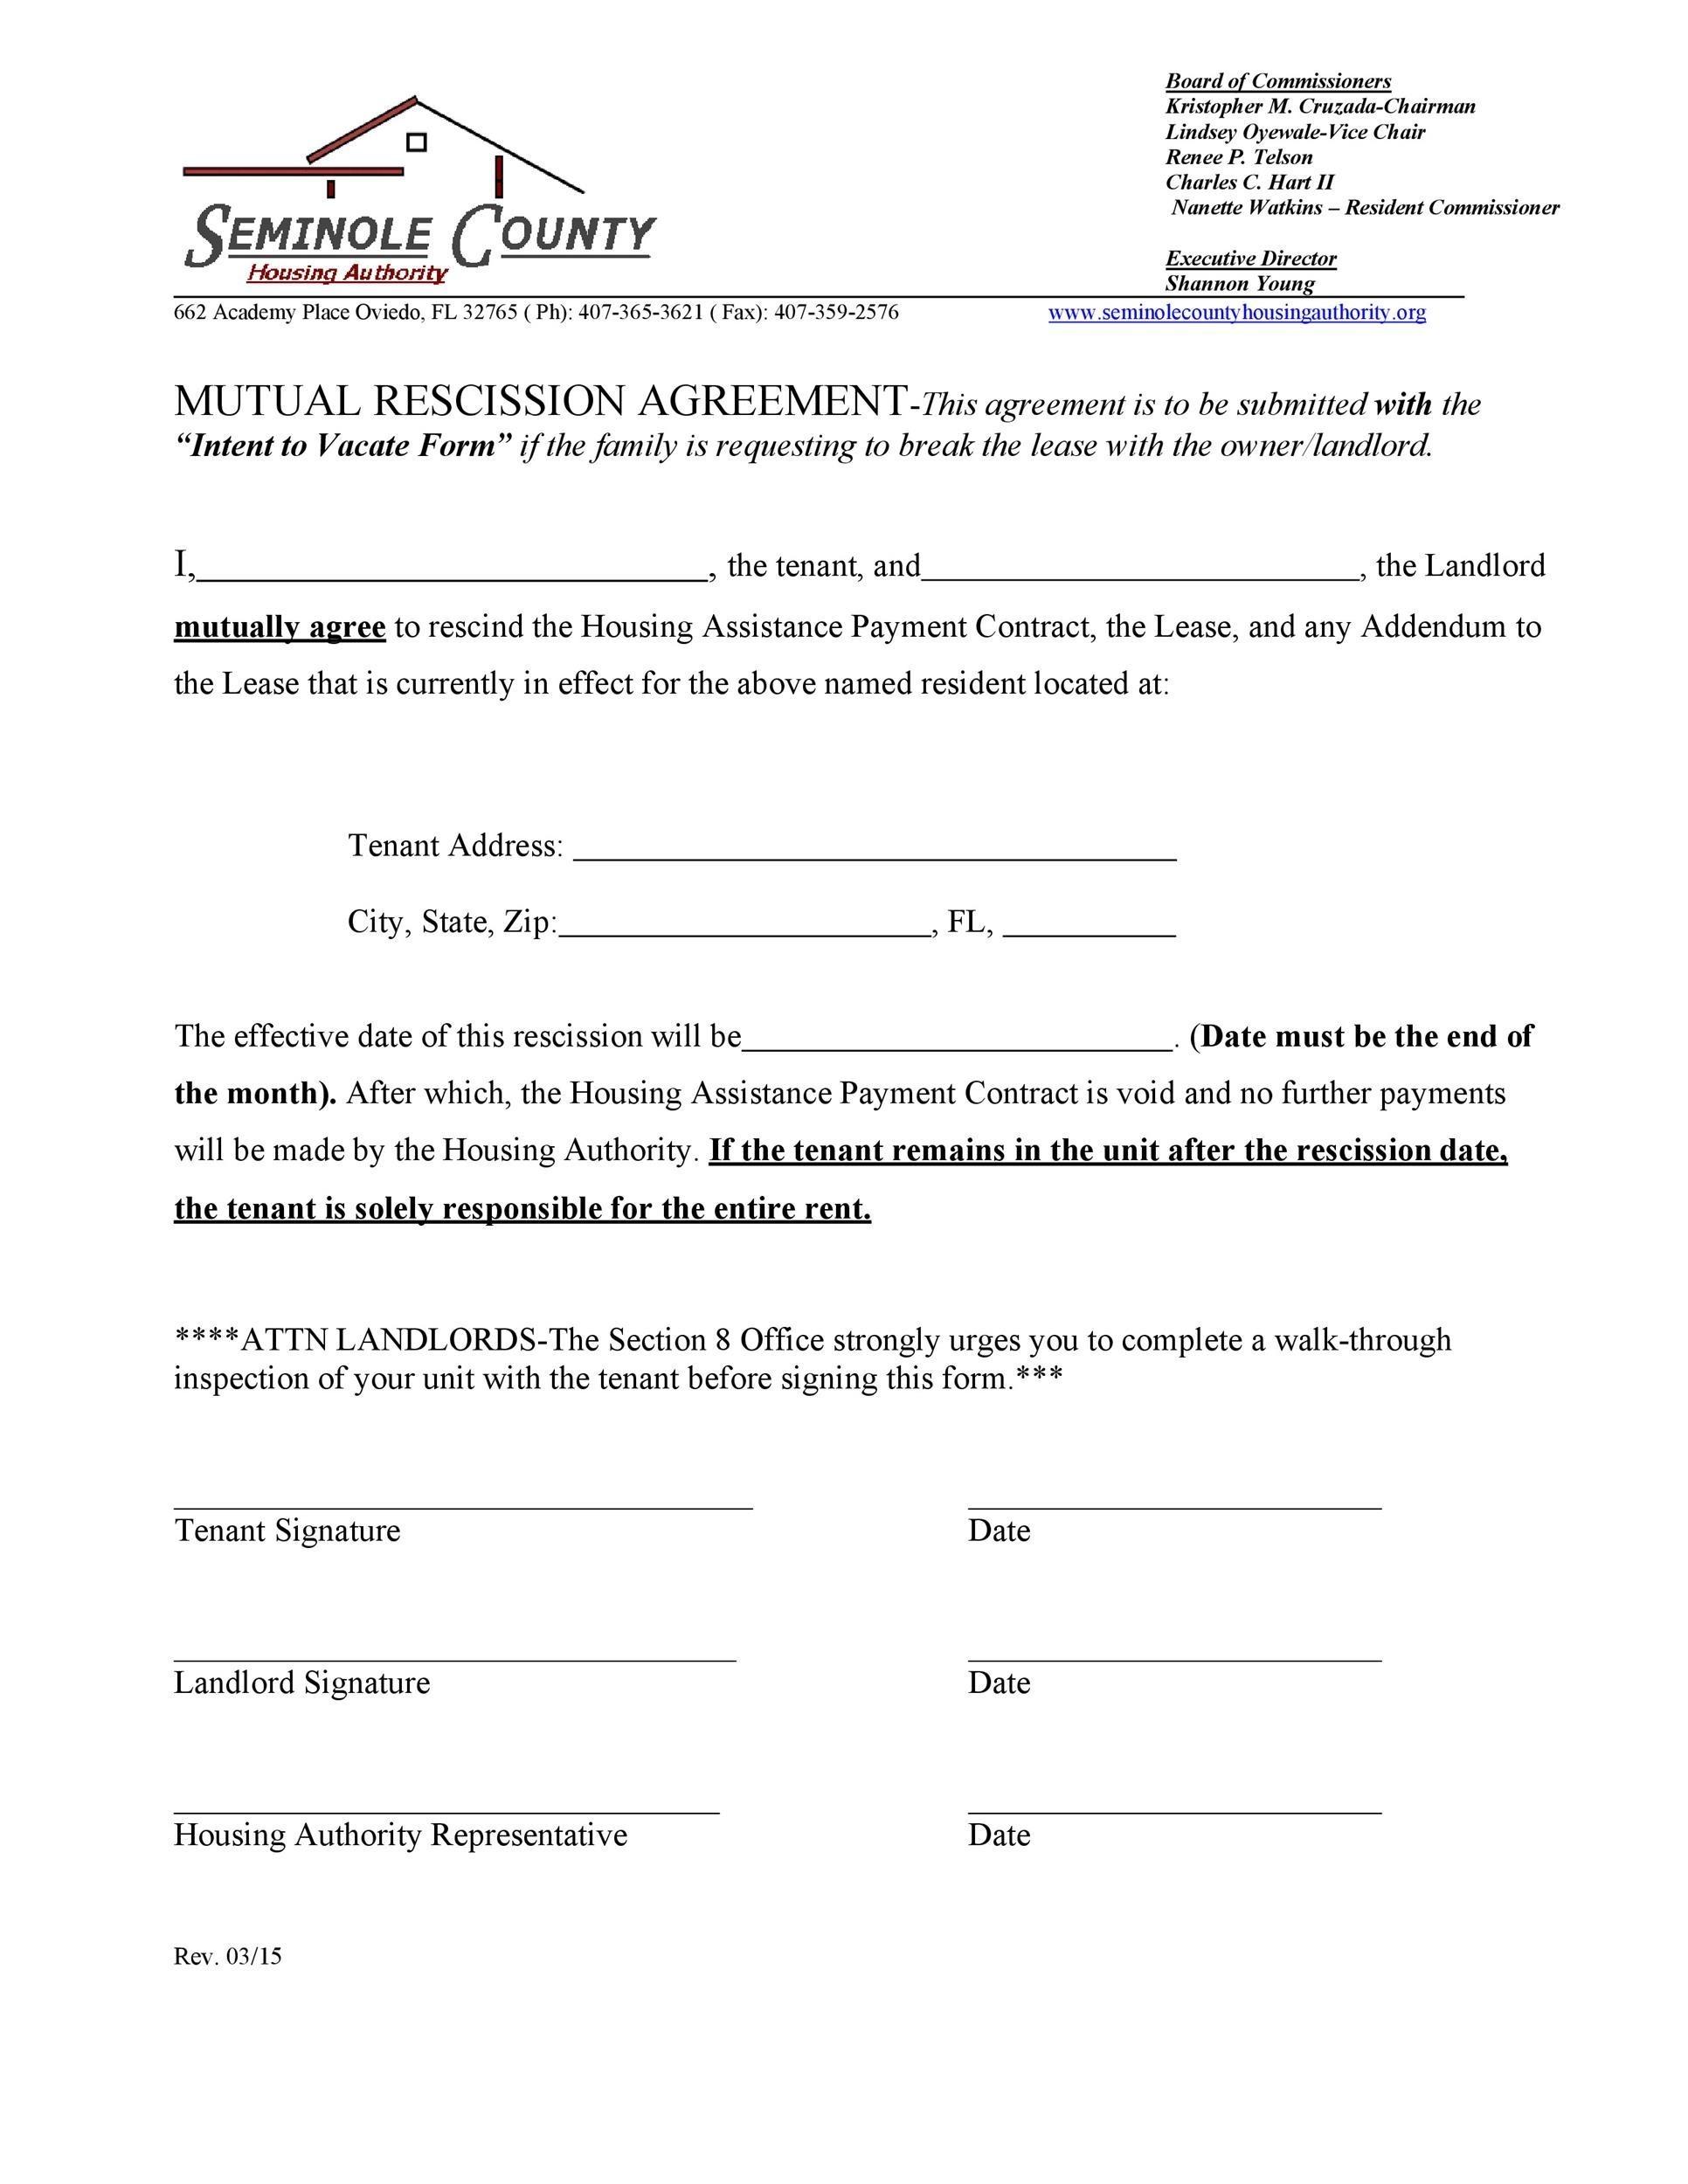 Free rescission agreement 32